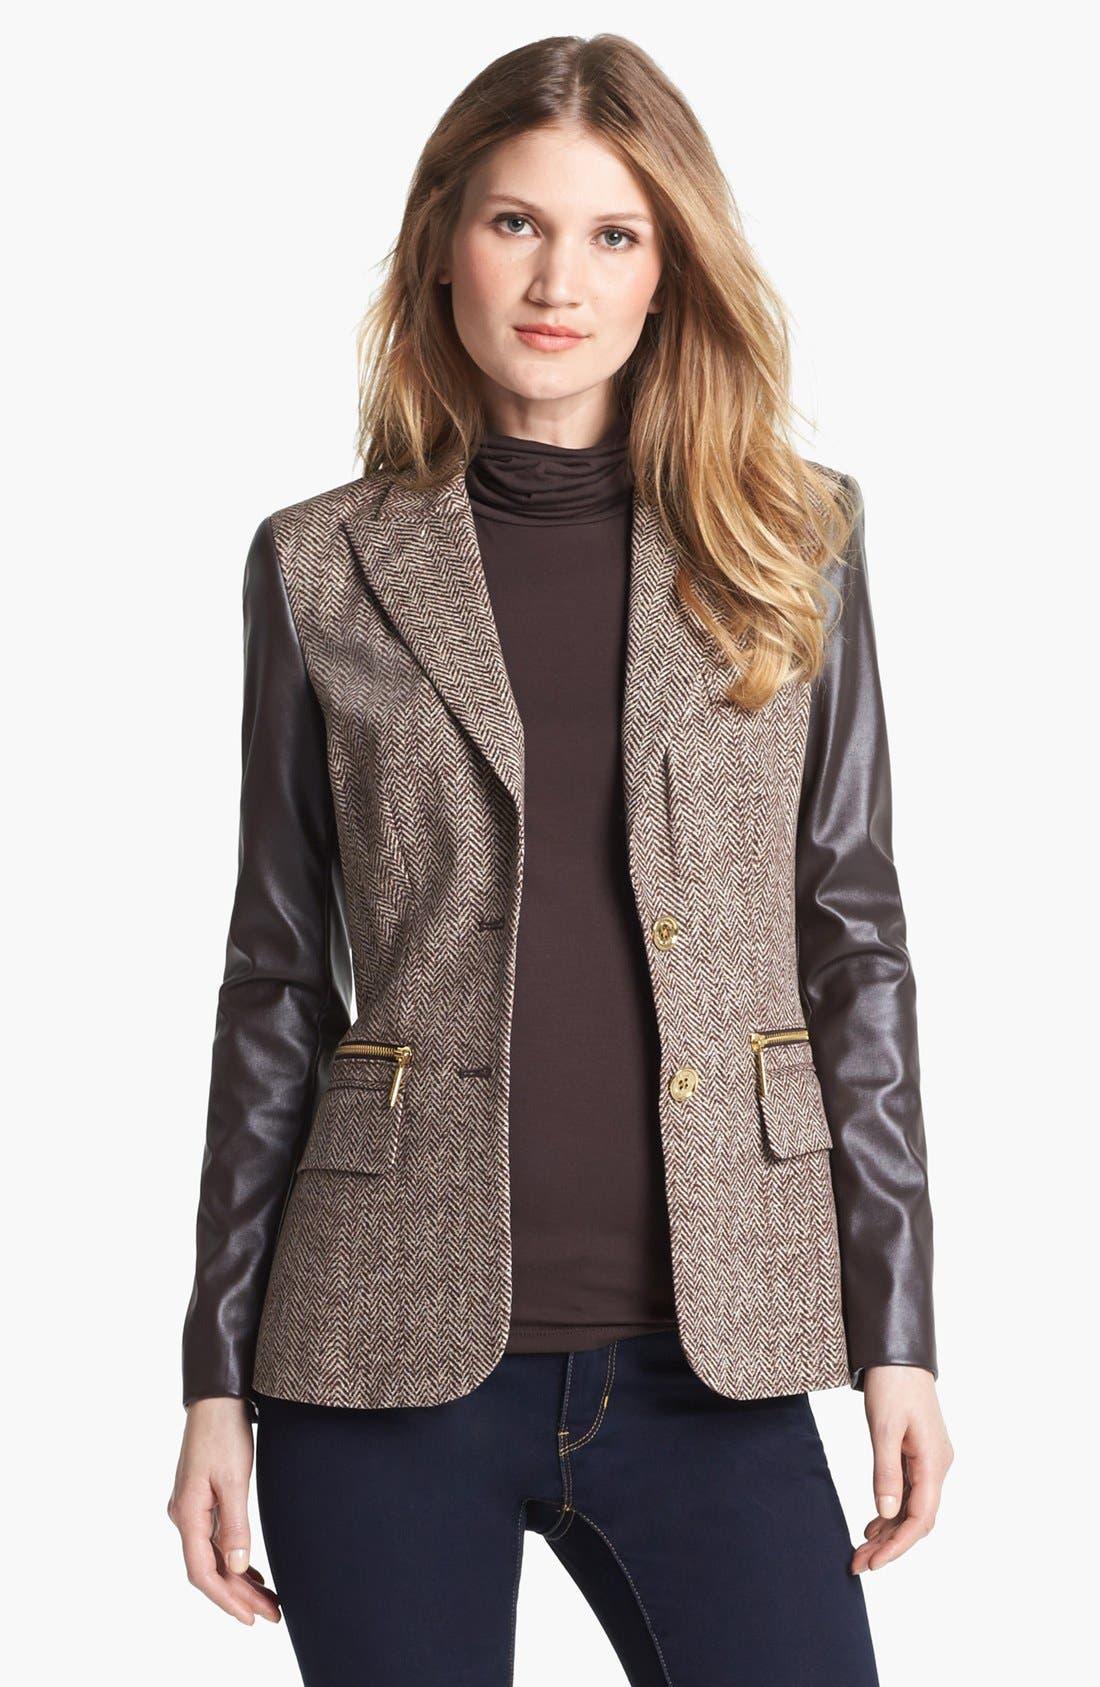 Alternate Image 1 Selected - MICHAEL Michael Kors Faux Leather Sleeve Tweed Blazer